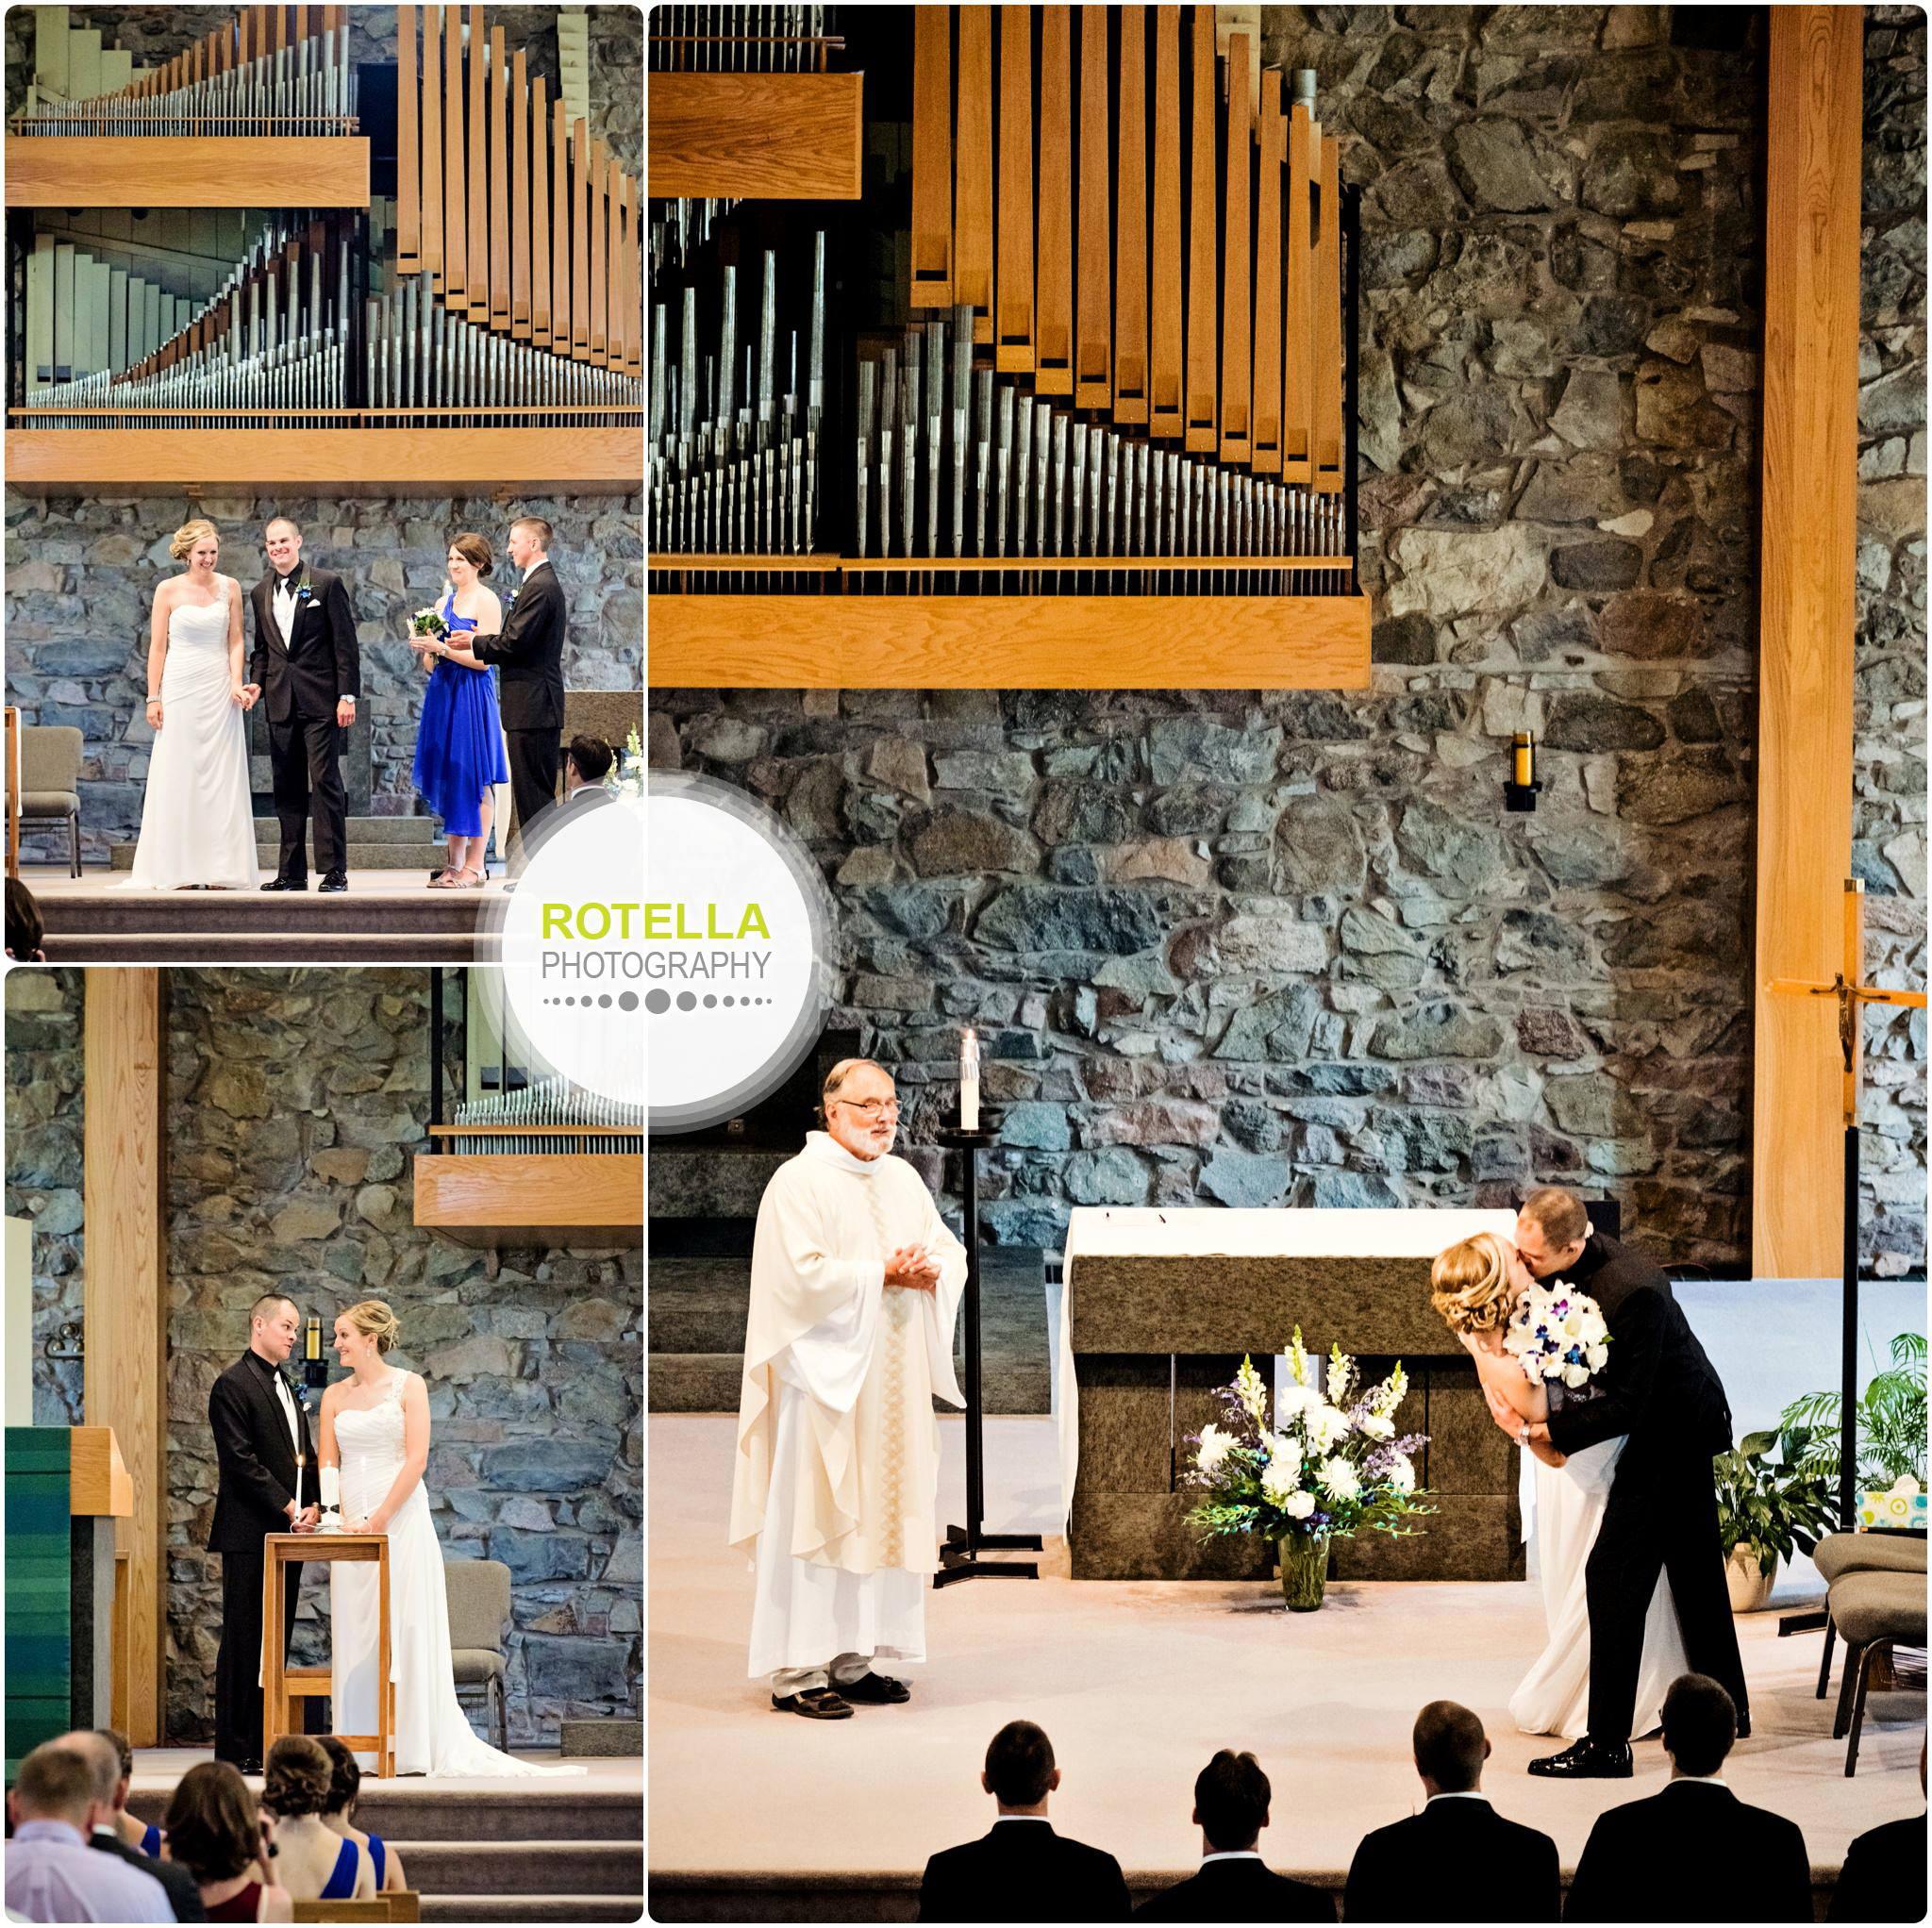 A College of St. Benedict's Wedding ceremony